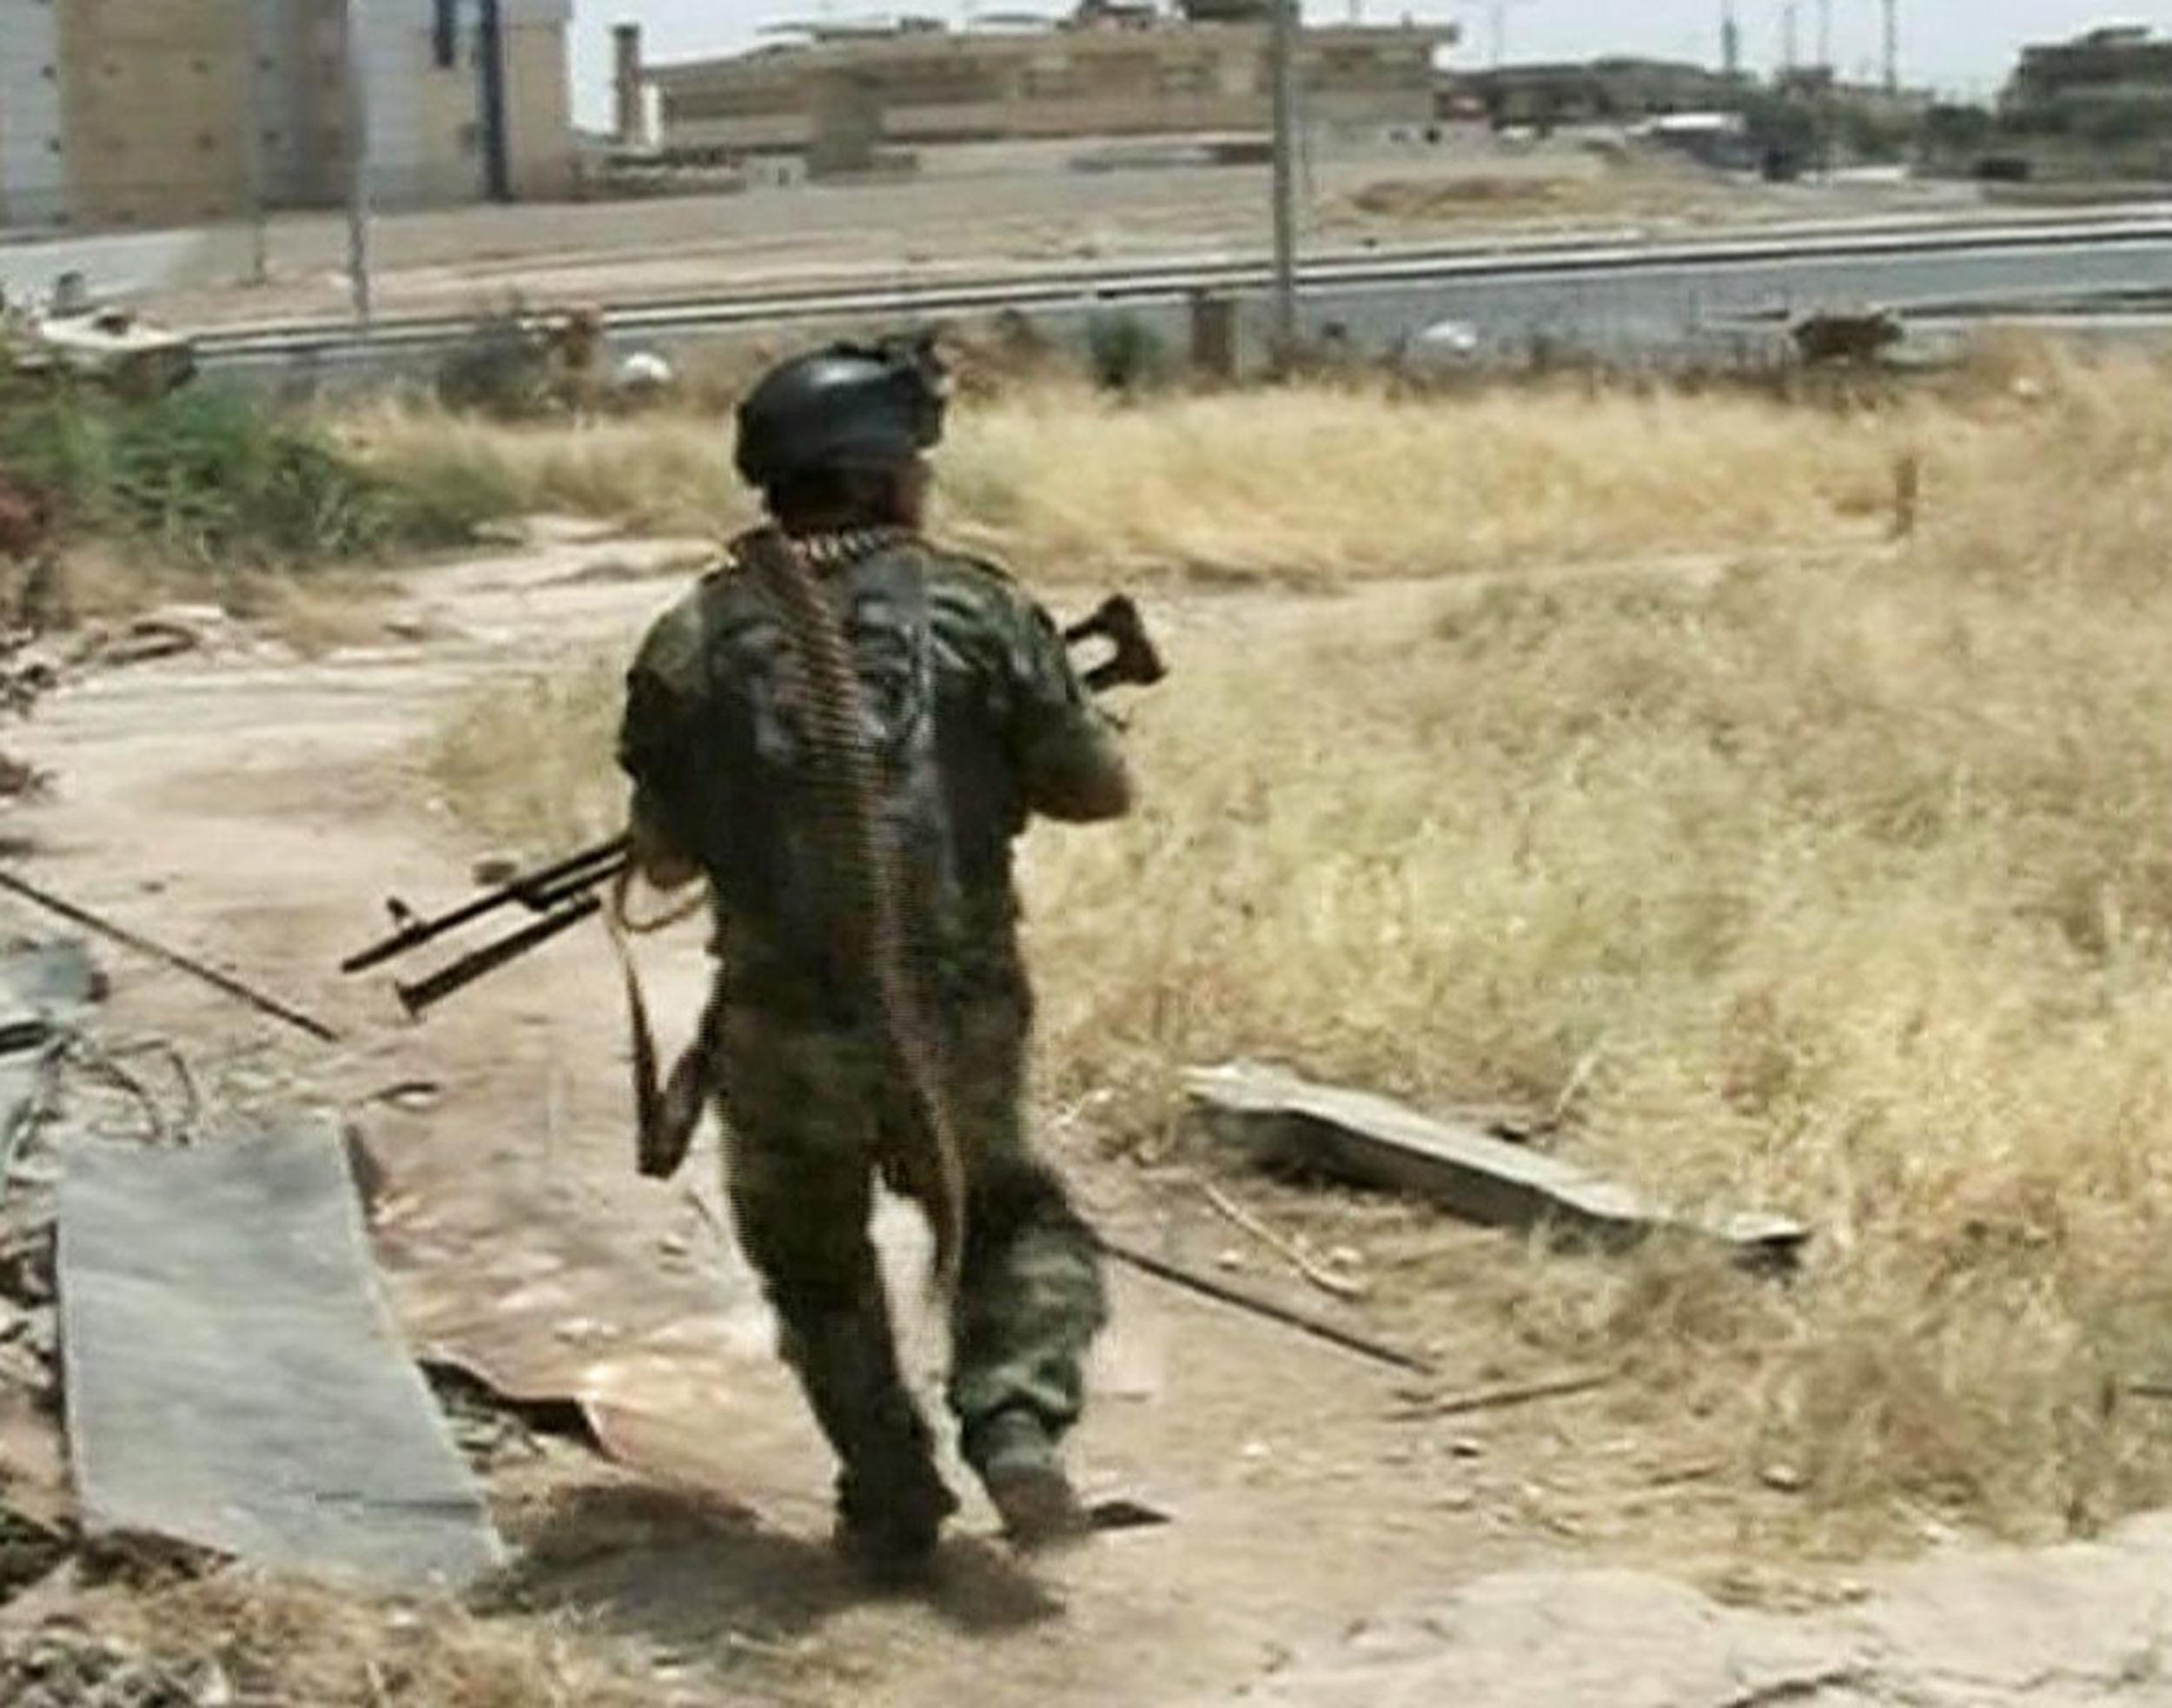 Image: Iraqi soldier in Mosul.